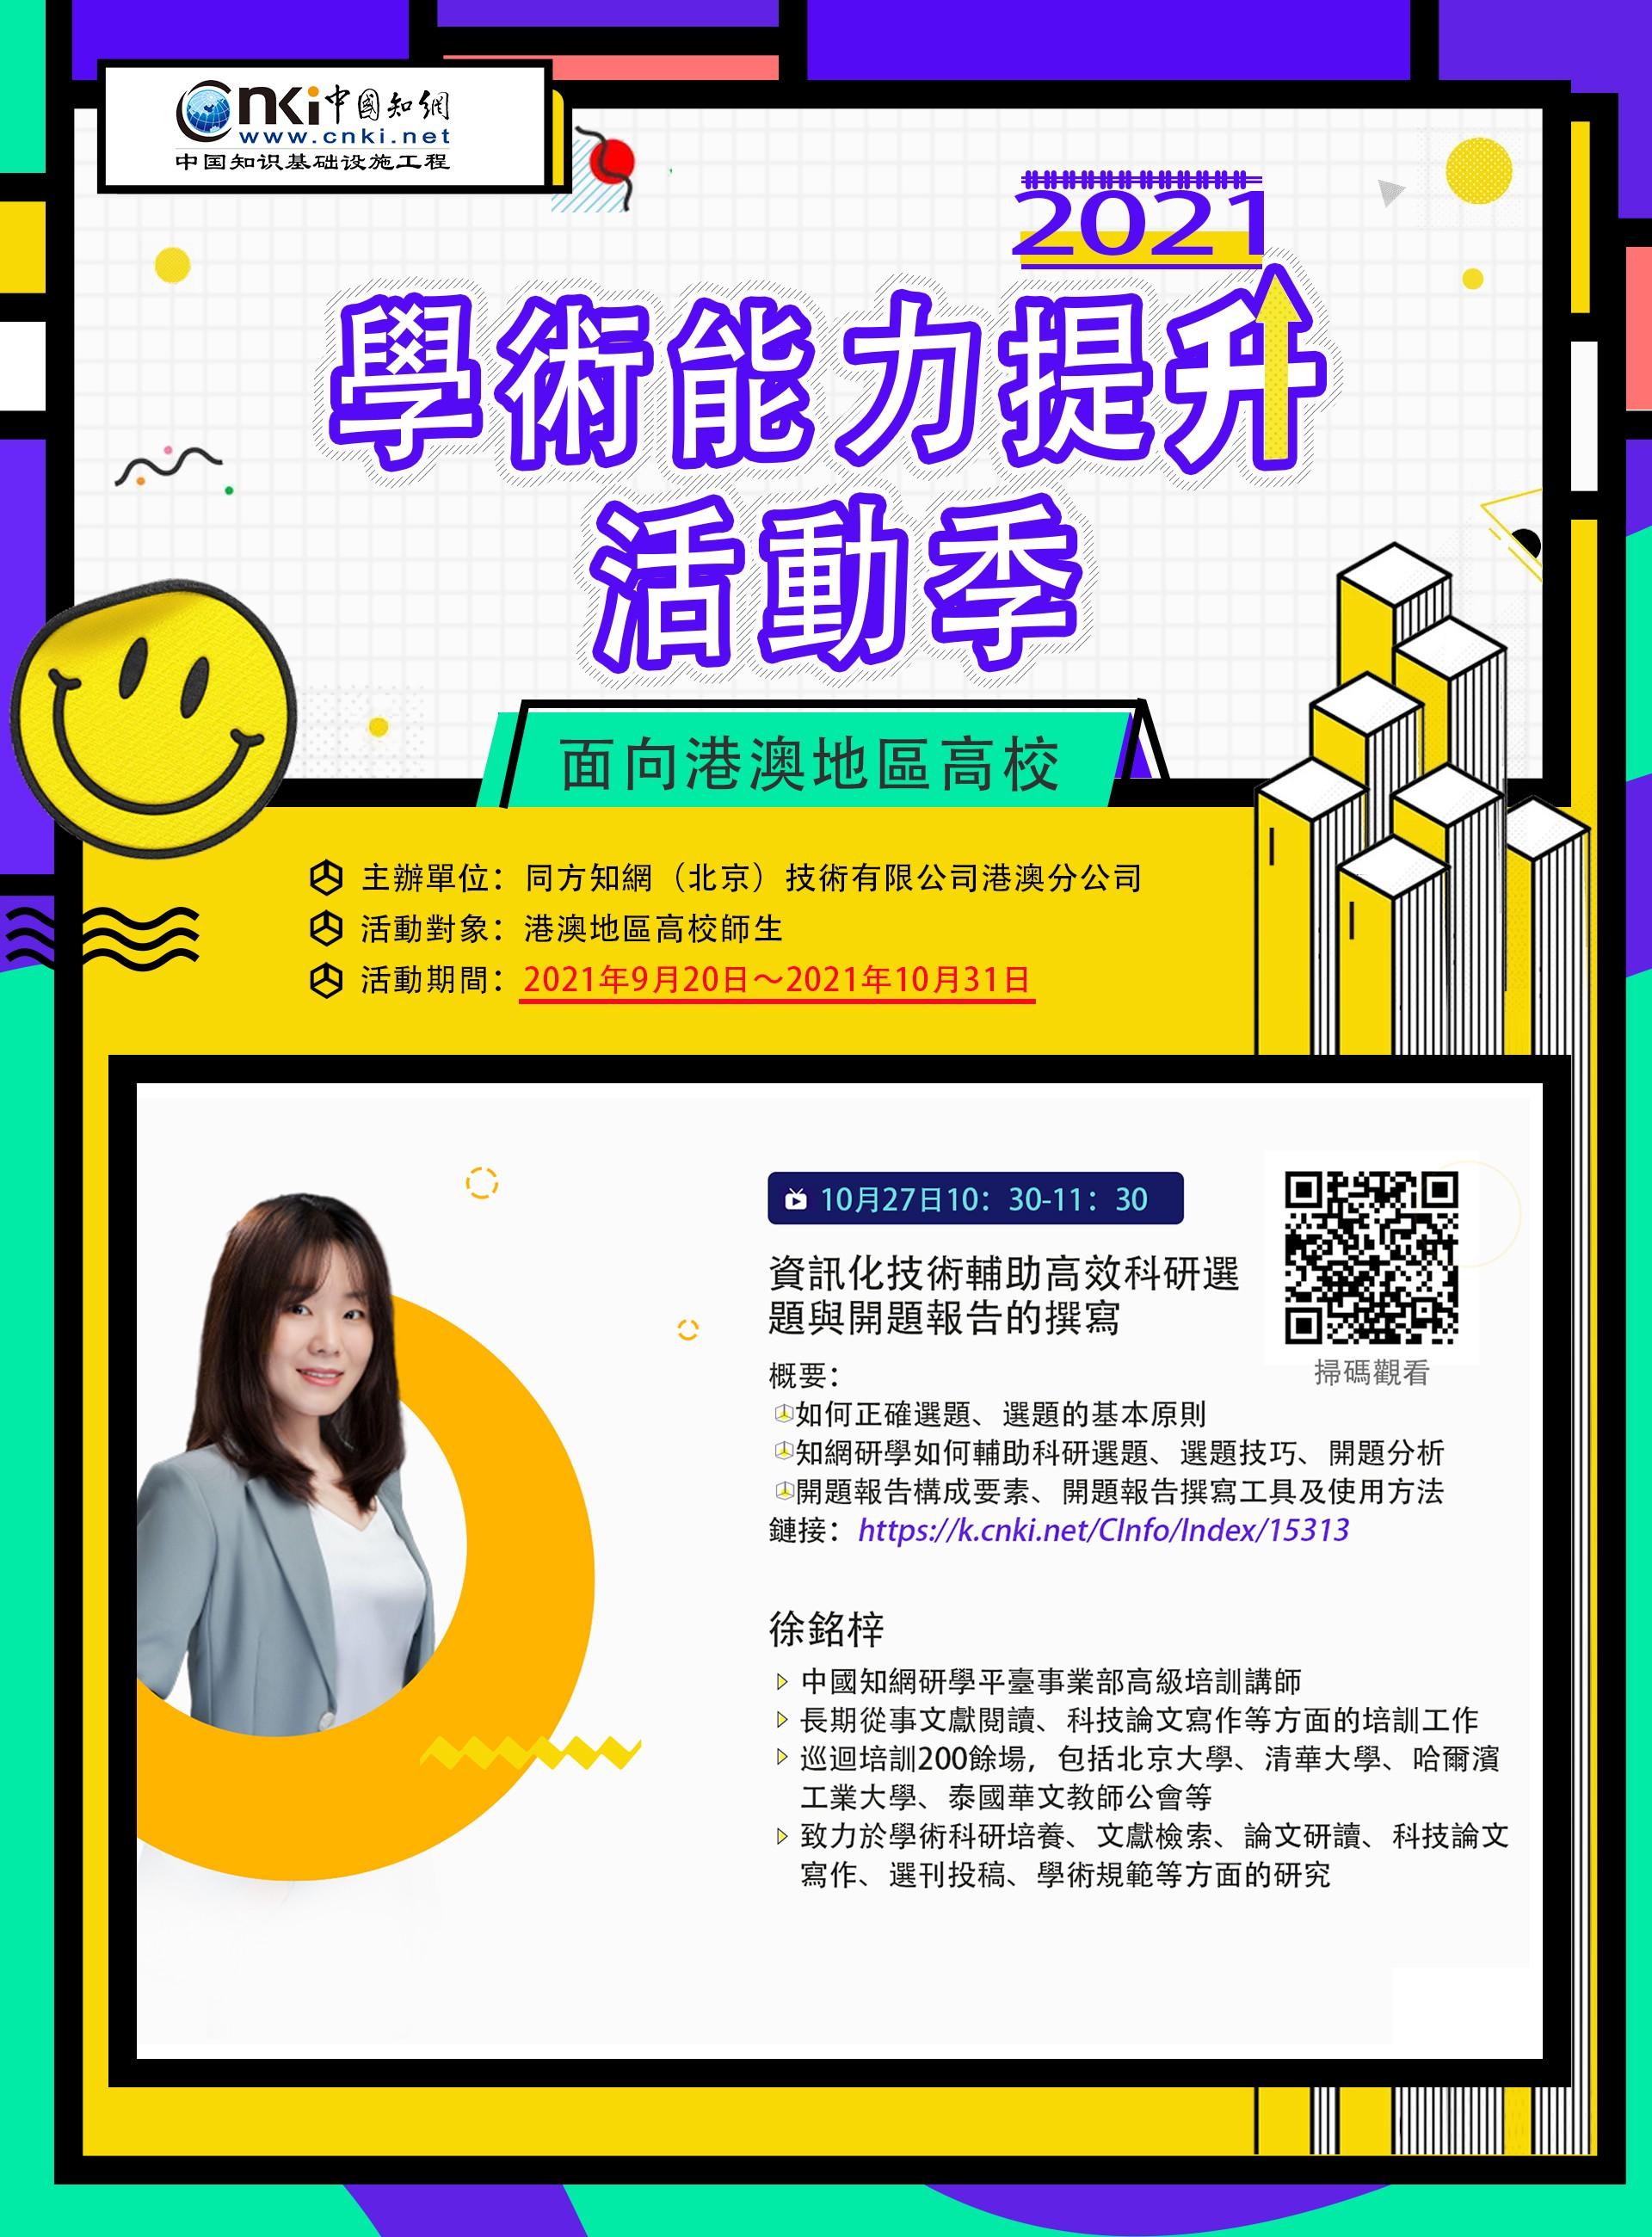 event-webinar-cnki-hkmo-20211027